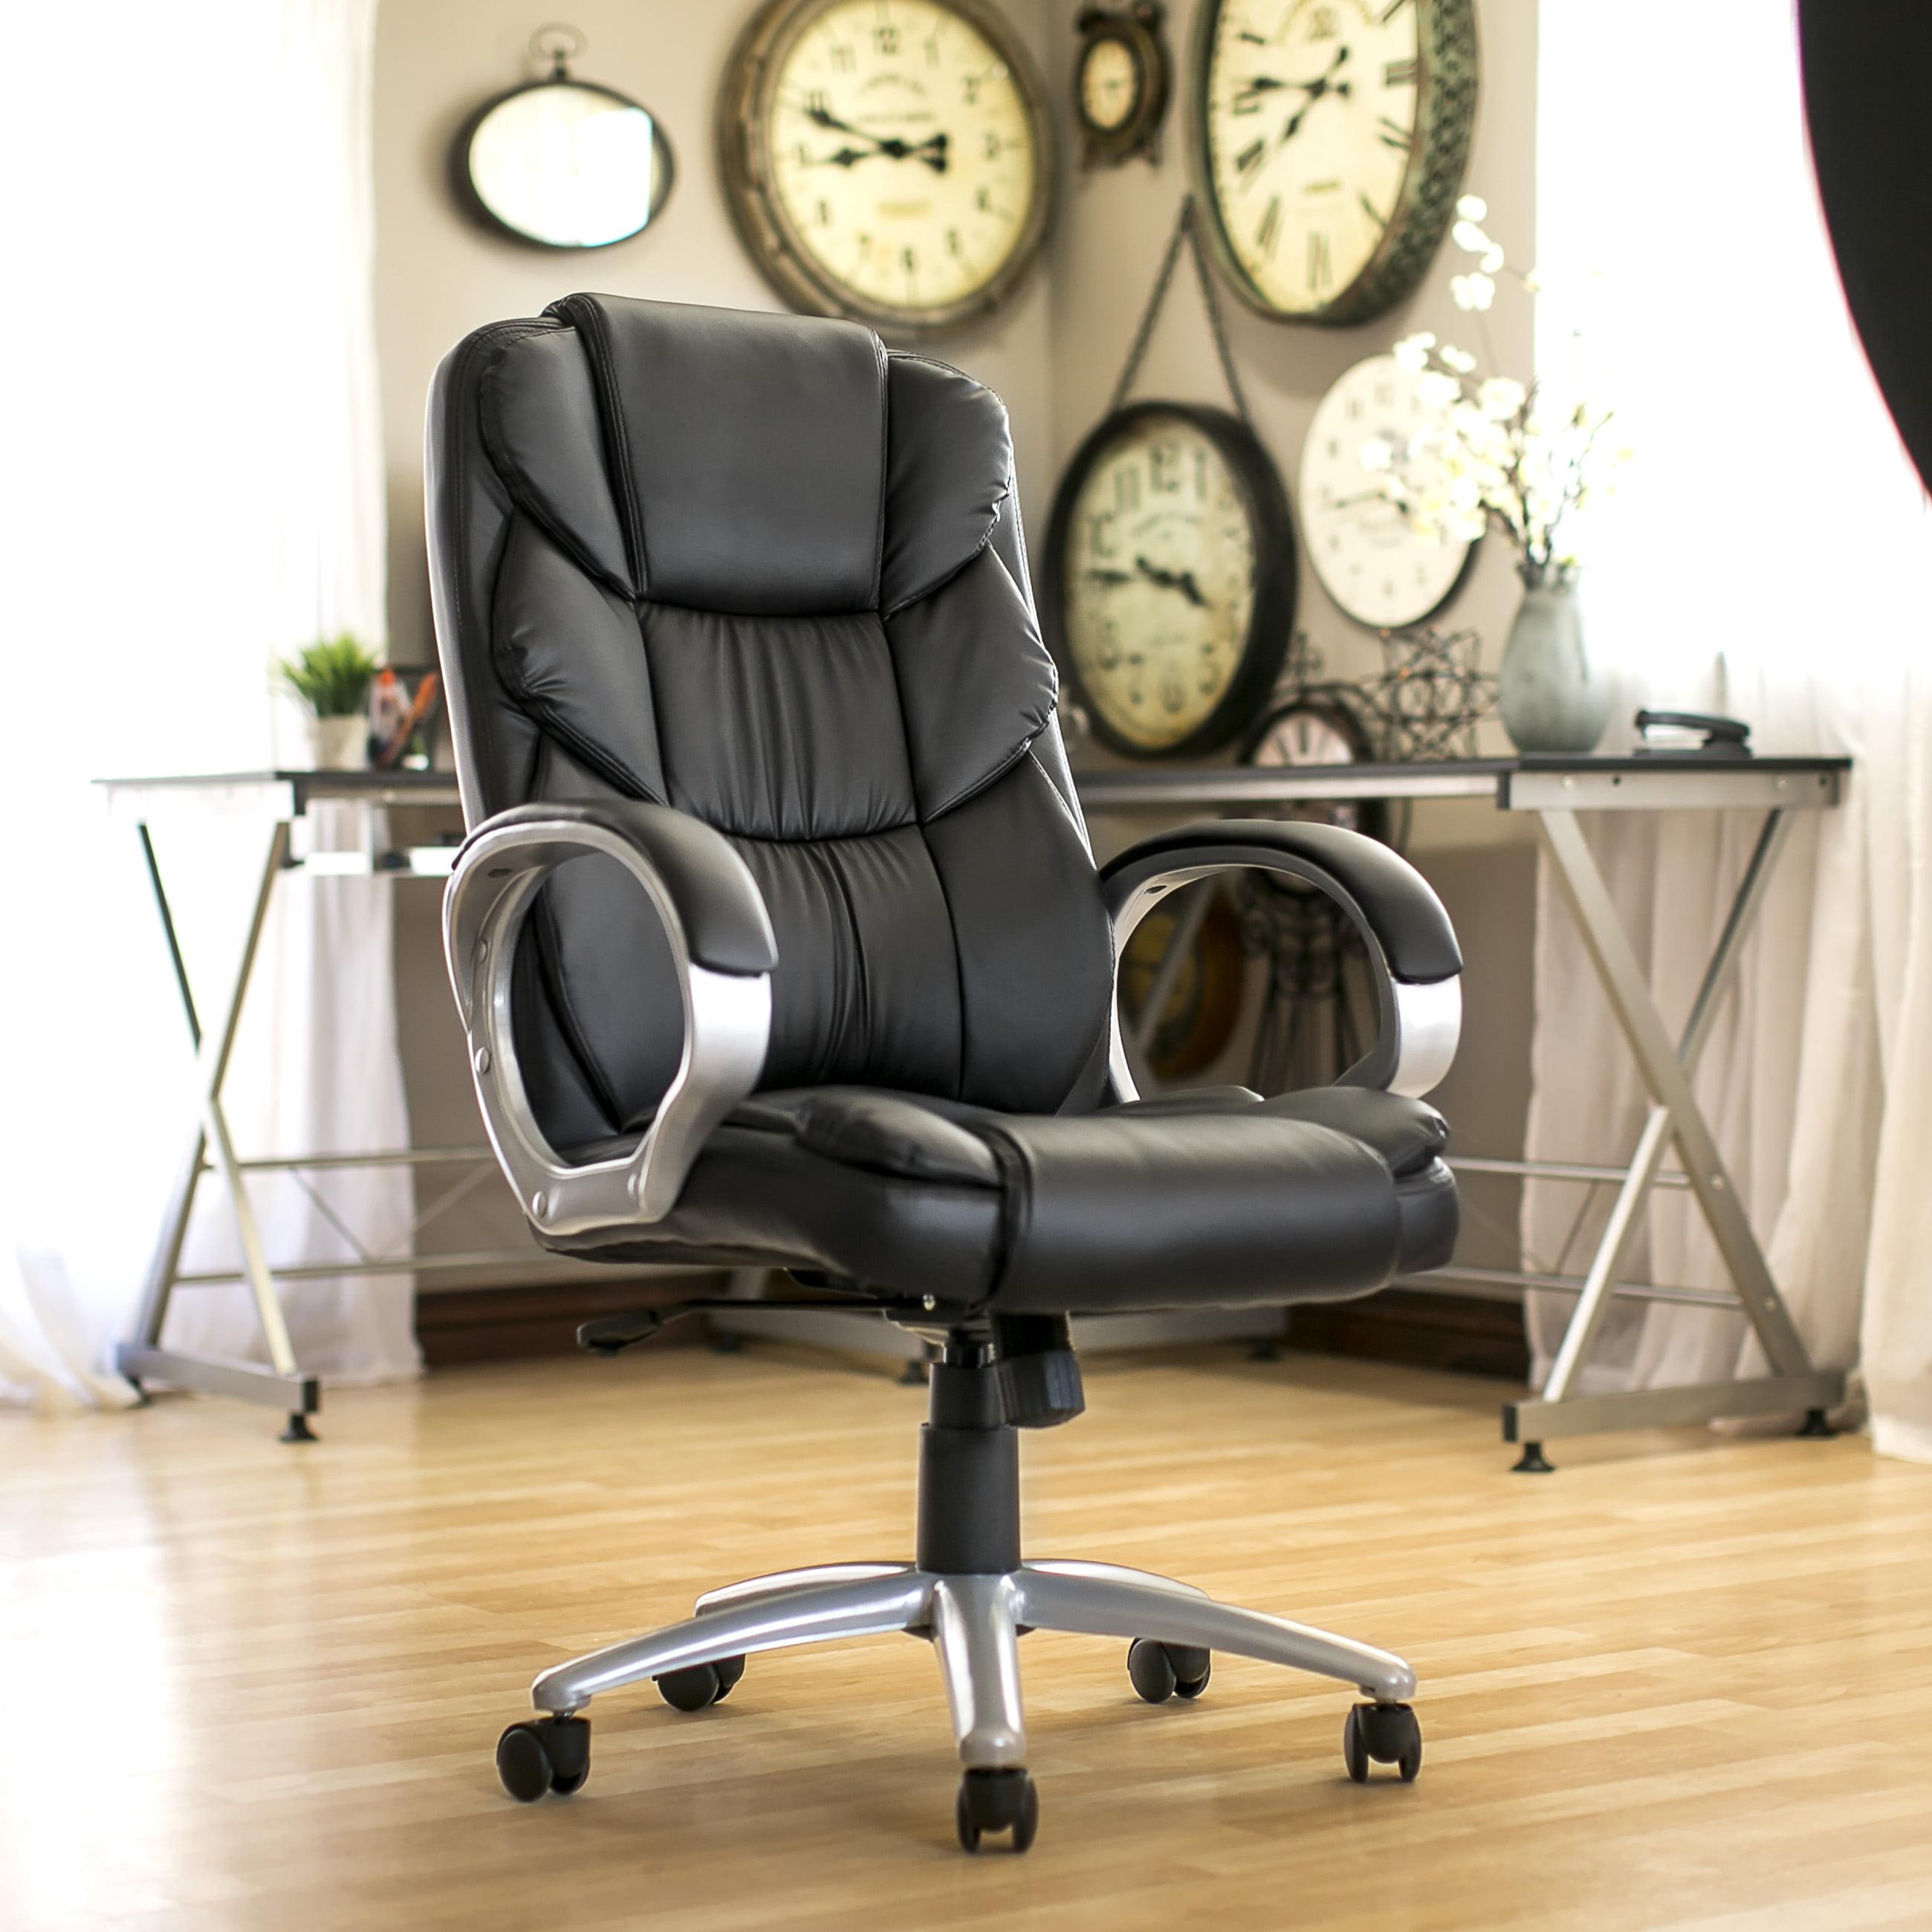 2c8c2fe2594 Ergonomic PU Leather High Back Office Chair